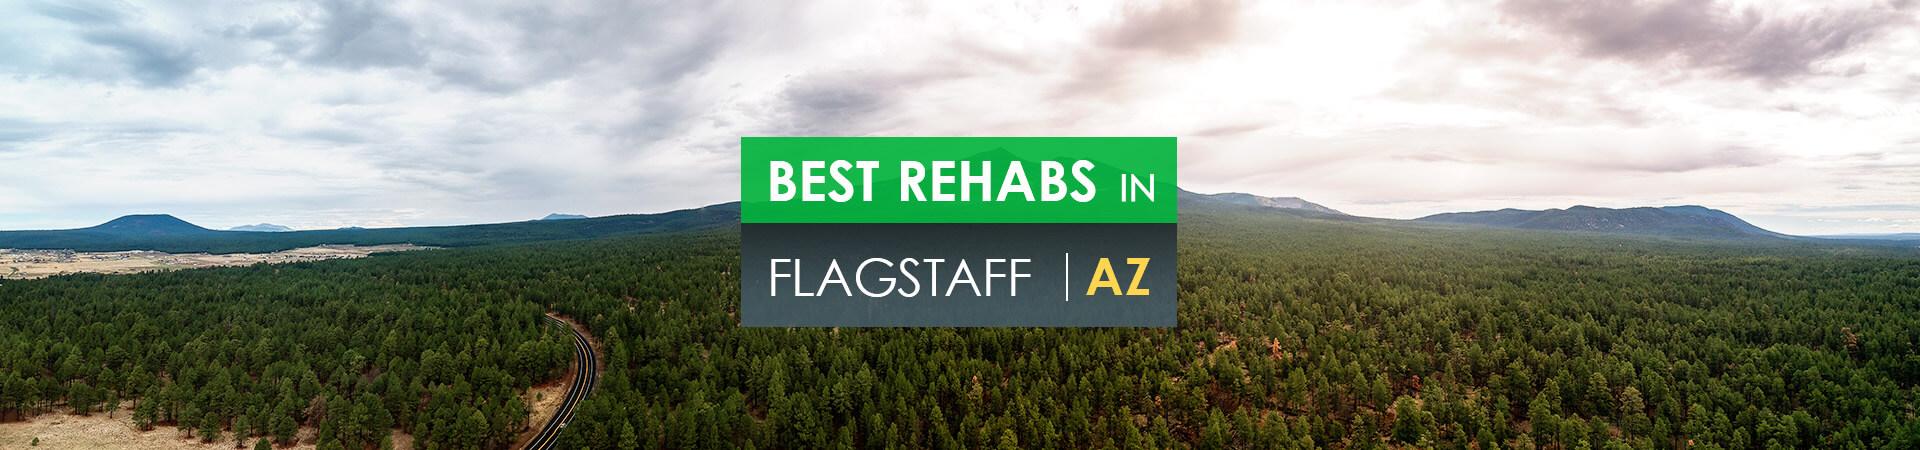 Best rehabs in Flagstaff, AZ